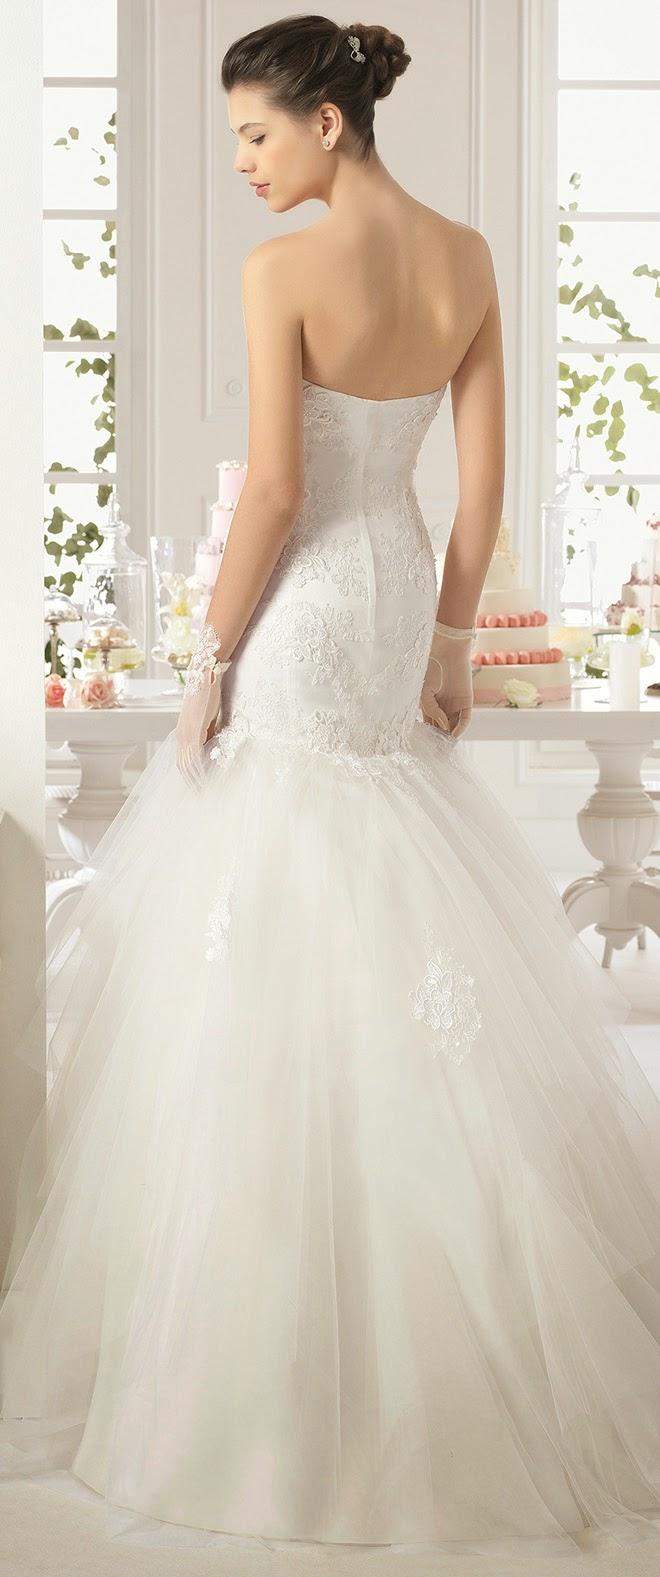 Vintage Ruffle Wedding Dress 76 Marvelous Please contact Aire Barcelona